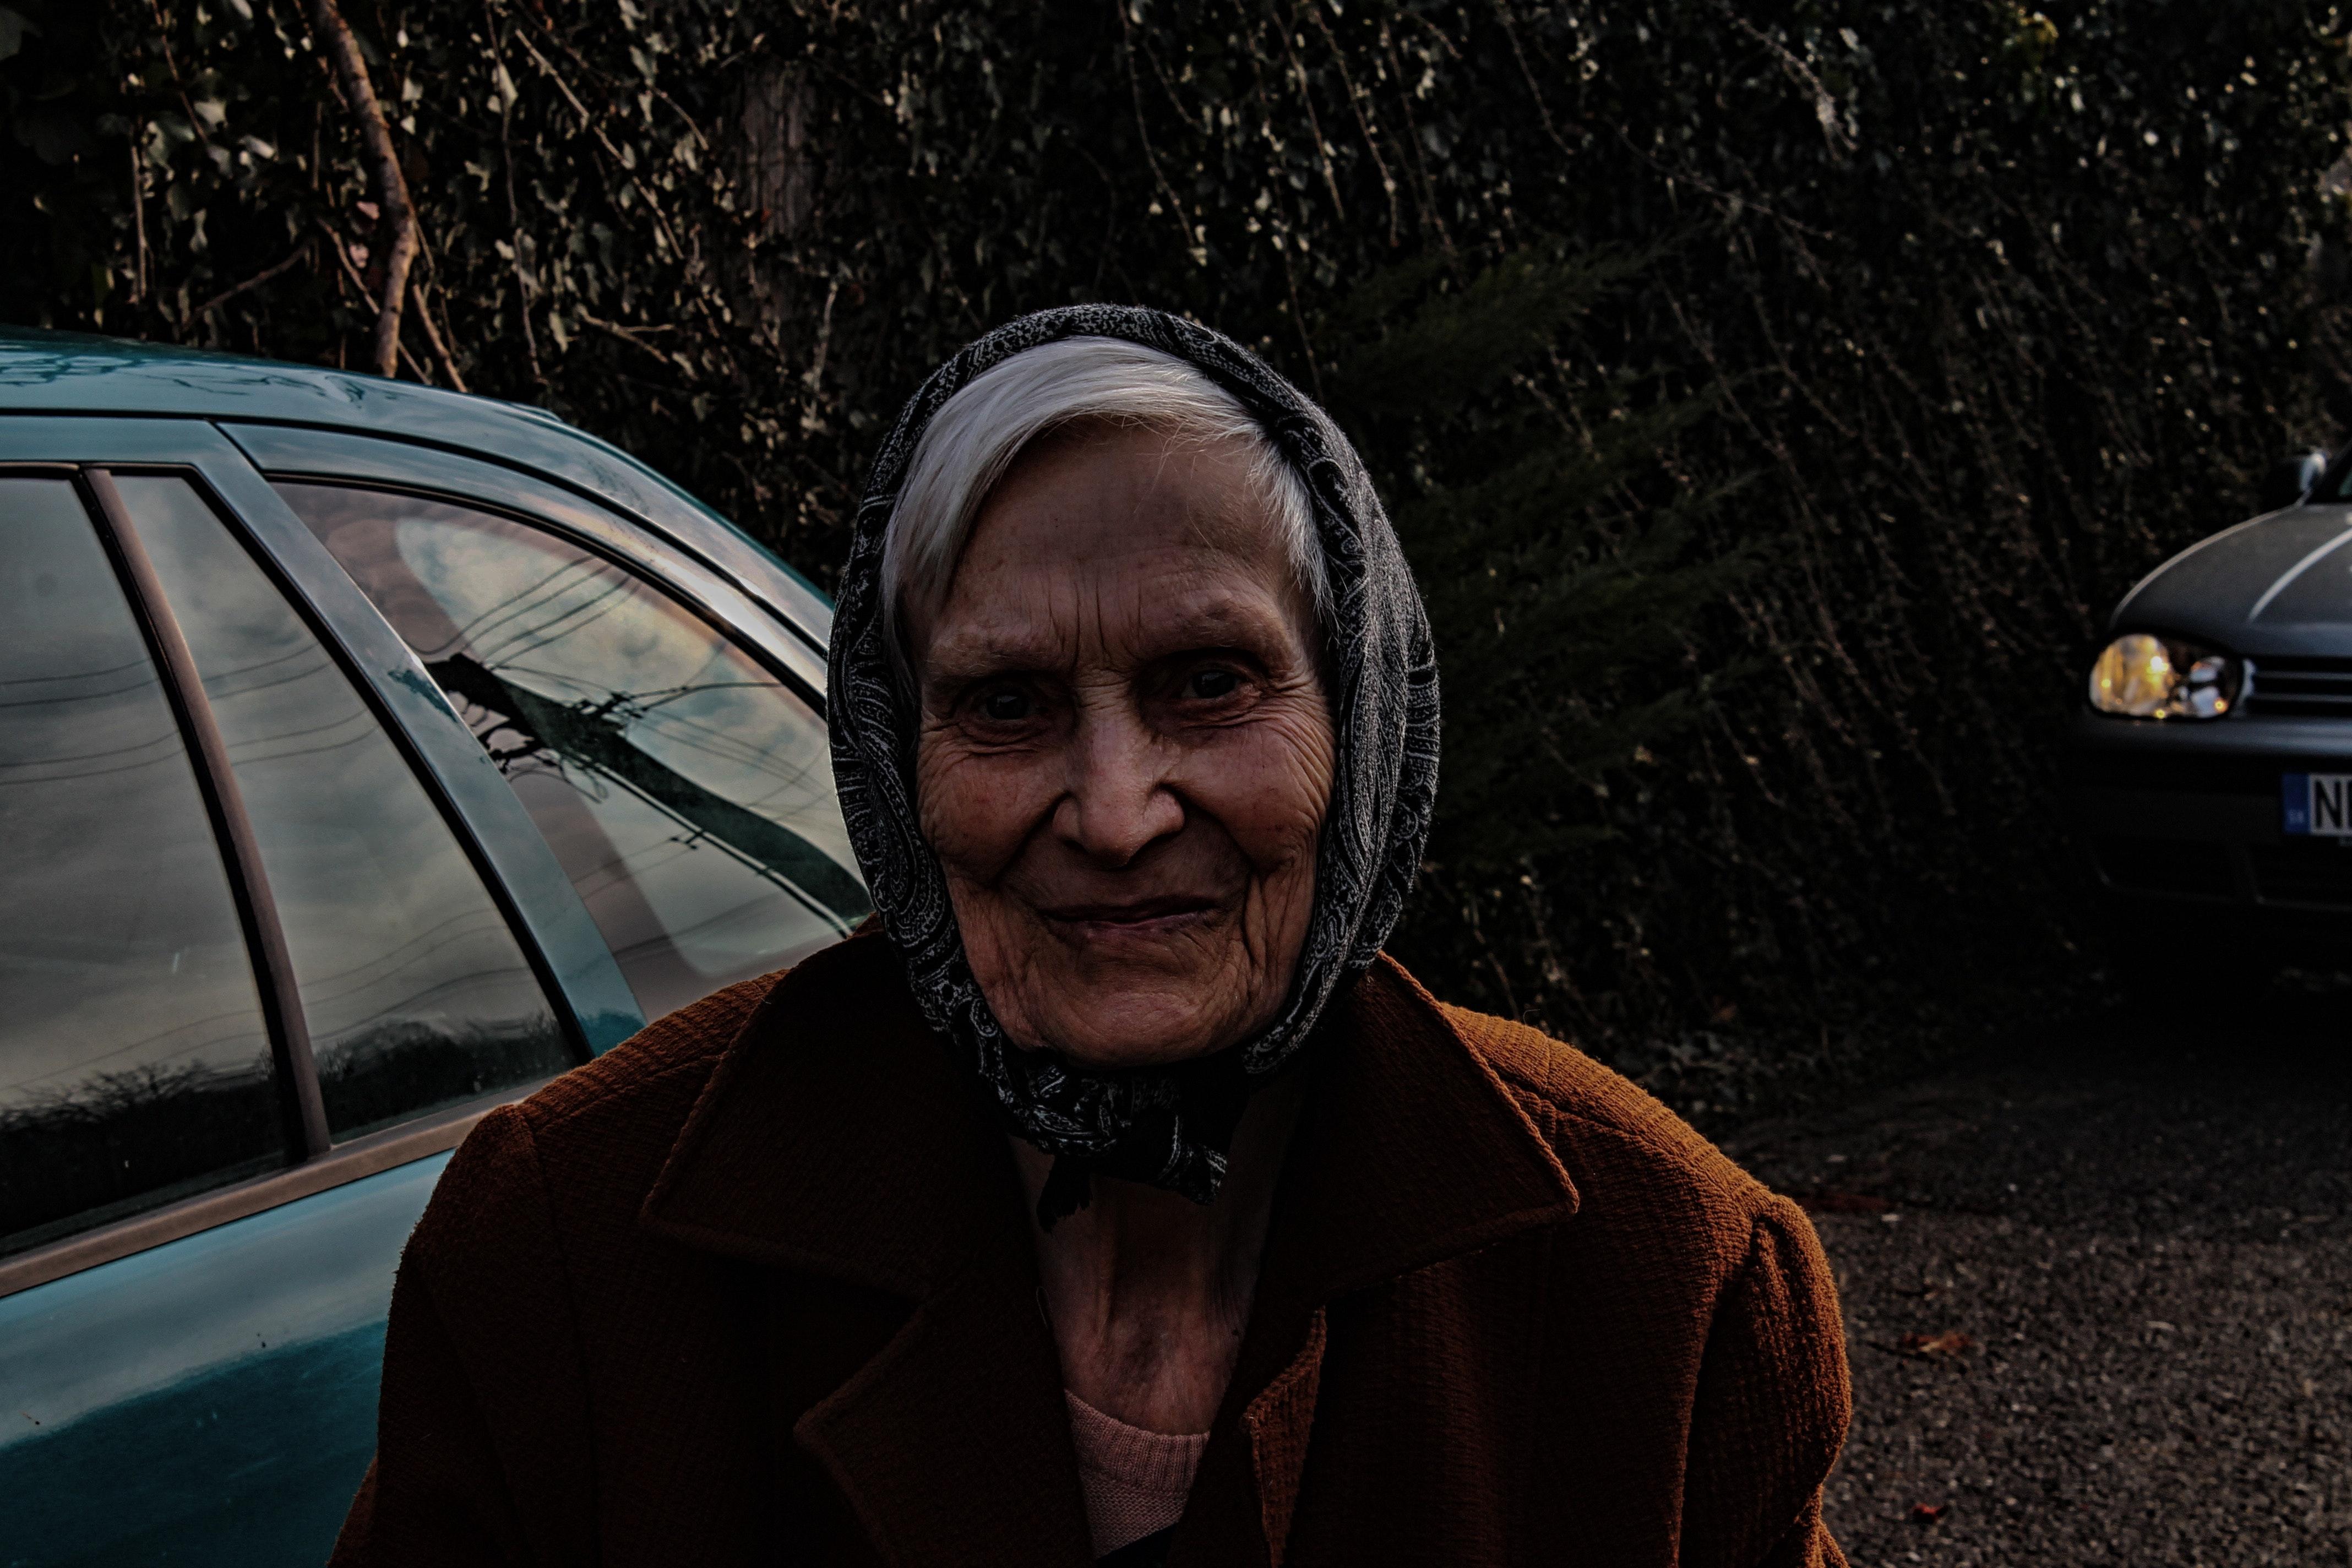 83 Gambar Nenek Hujan Paling Bagus